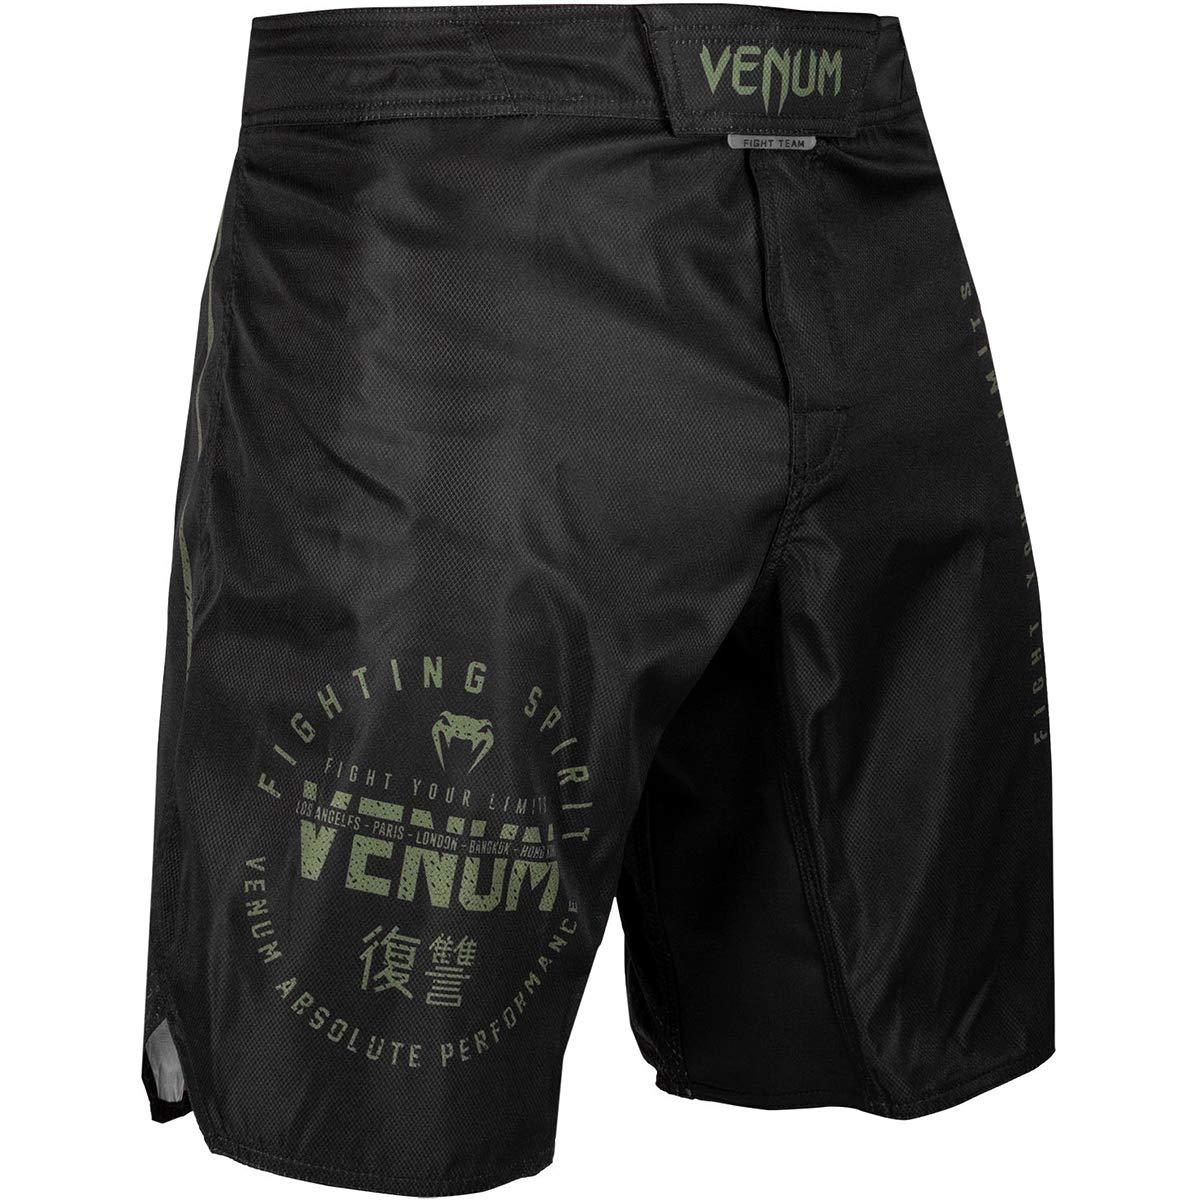 Venum Signature MMA Fight Shorts Black//Khaki